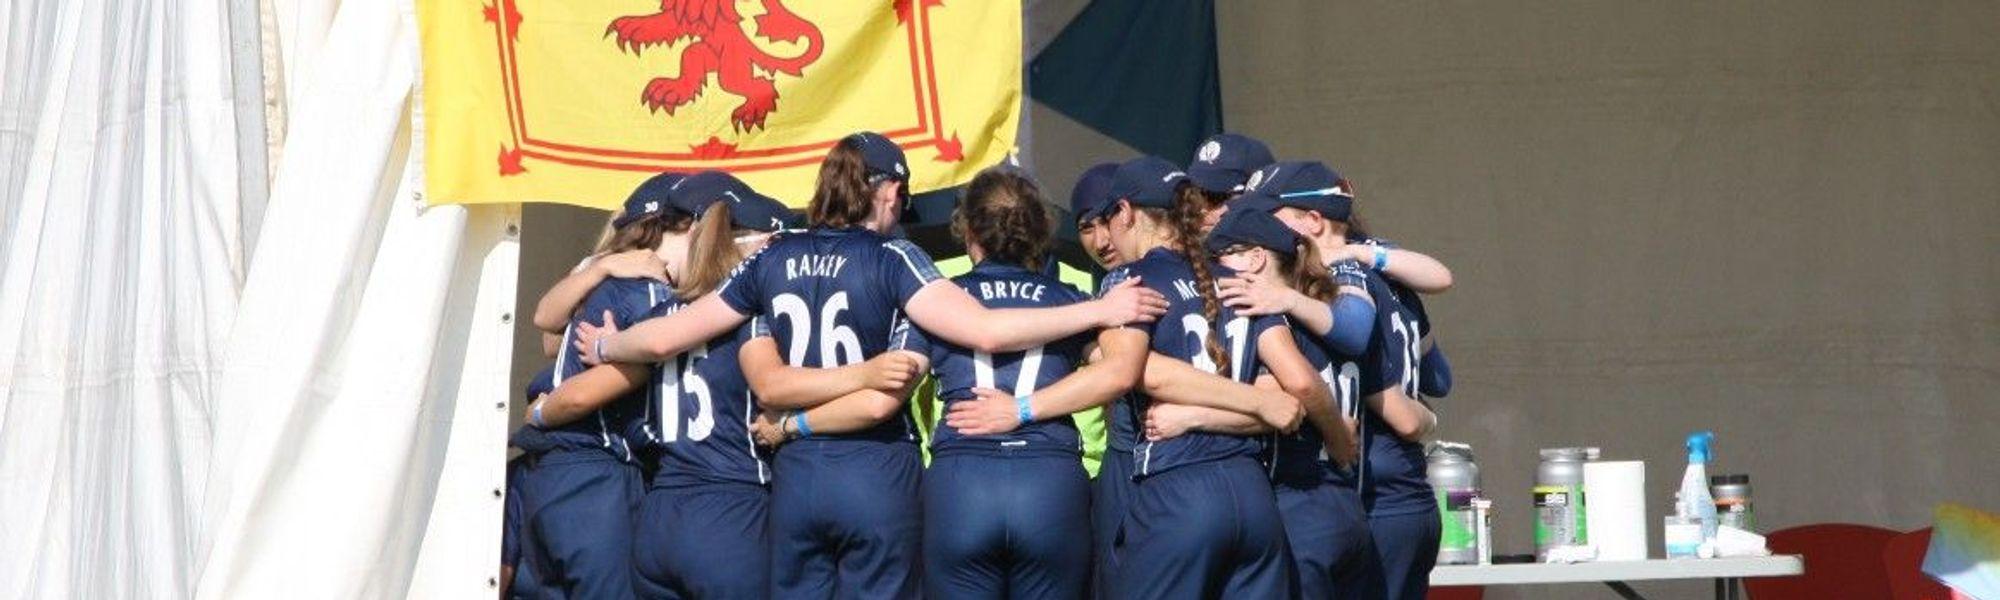 Scotland women's team